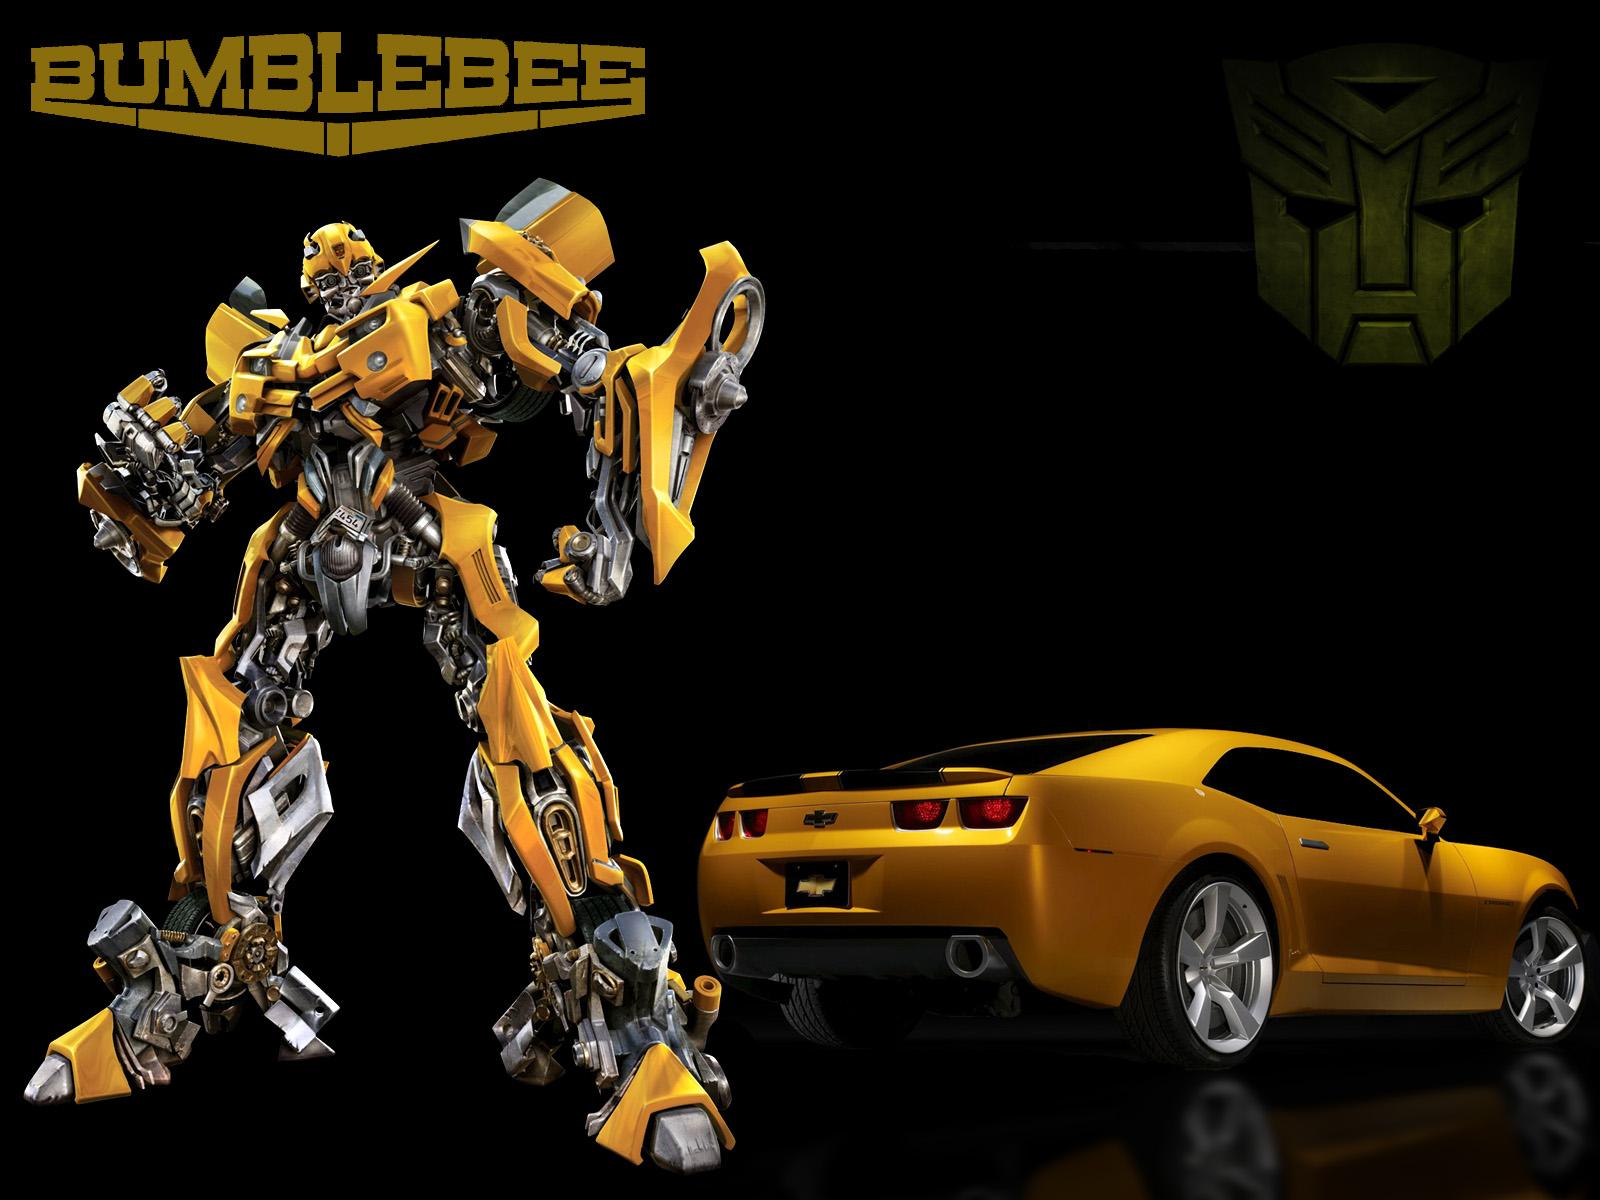 Transformers 4 Bumblebee WallpapersWide  - bumblebee in new transformers wallpapers